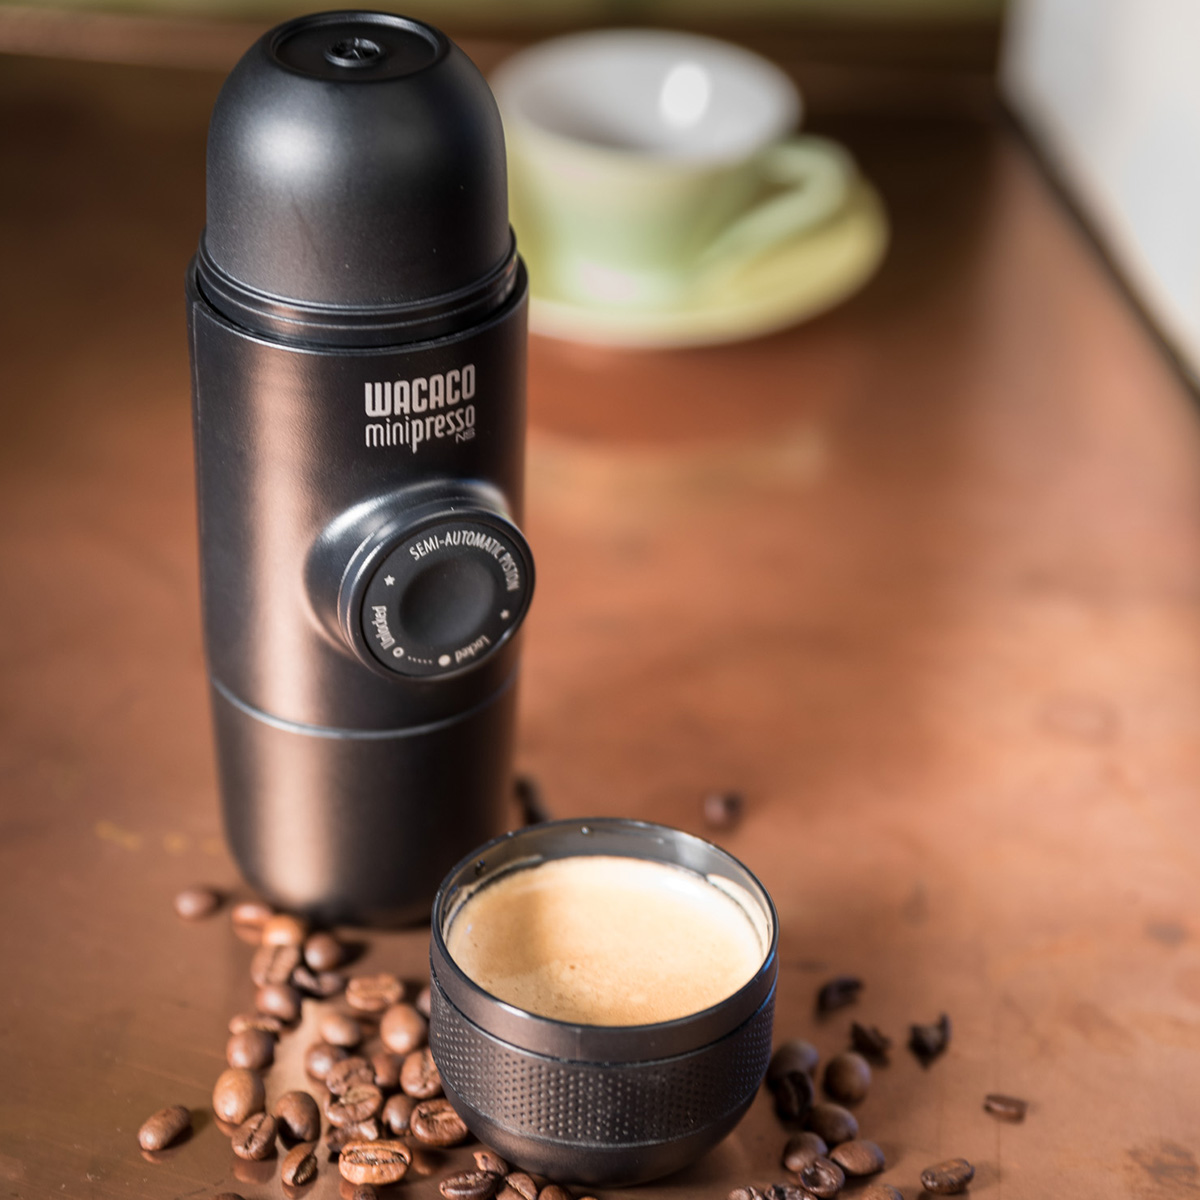 Wacacominipresso  - Minipresso - meest compacte espressomachine ter wereld - Capsules(NS )